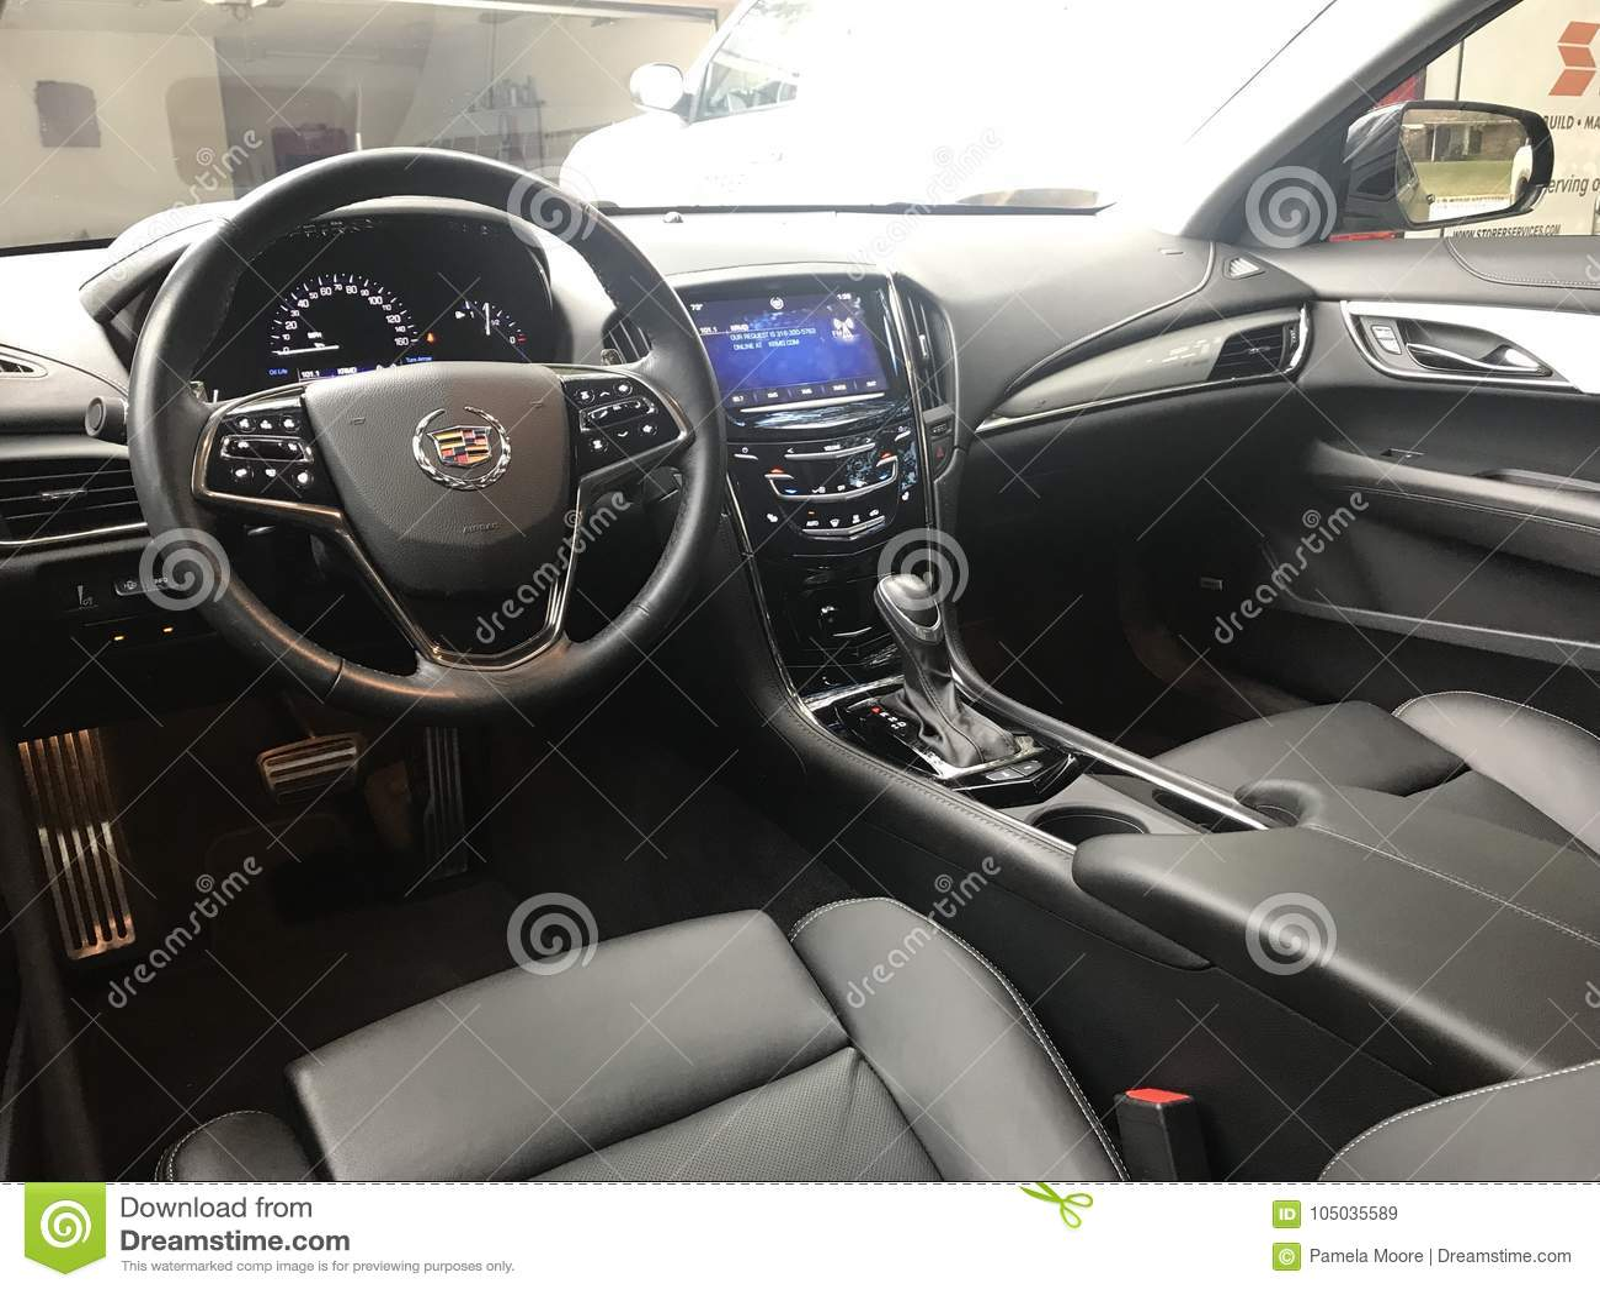 Cadillac Ats Editorial Stock Image Image Of Luxury 105035589